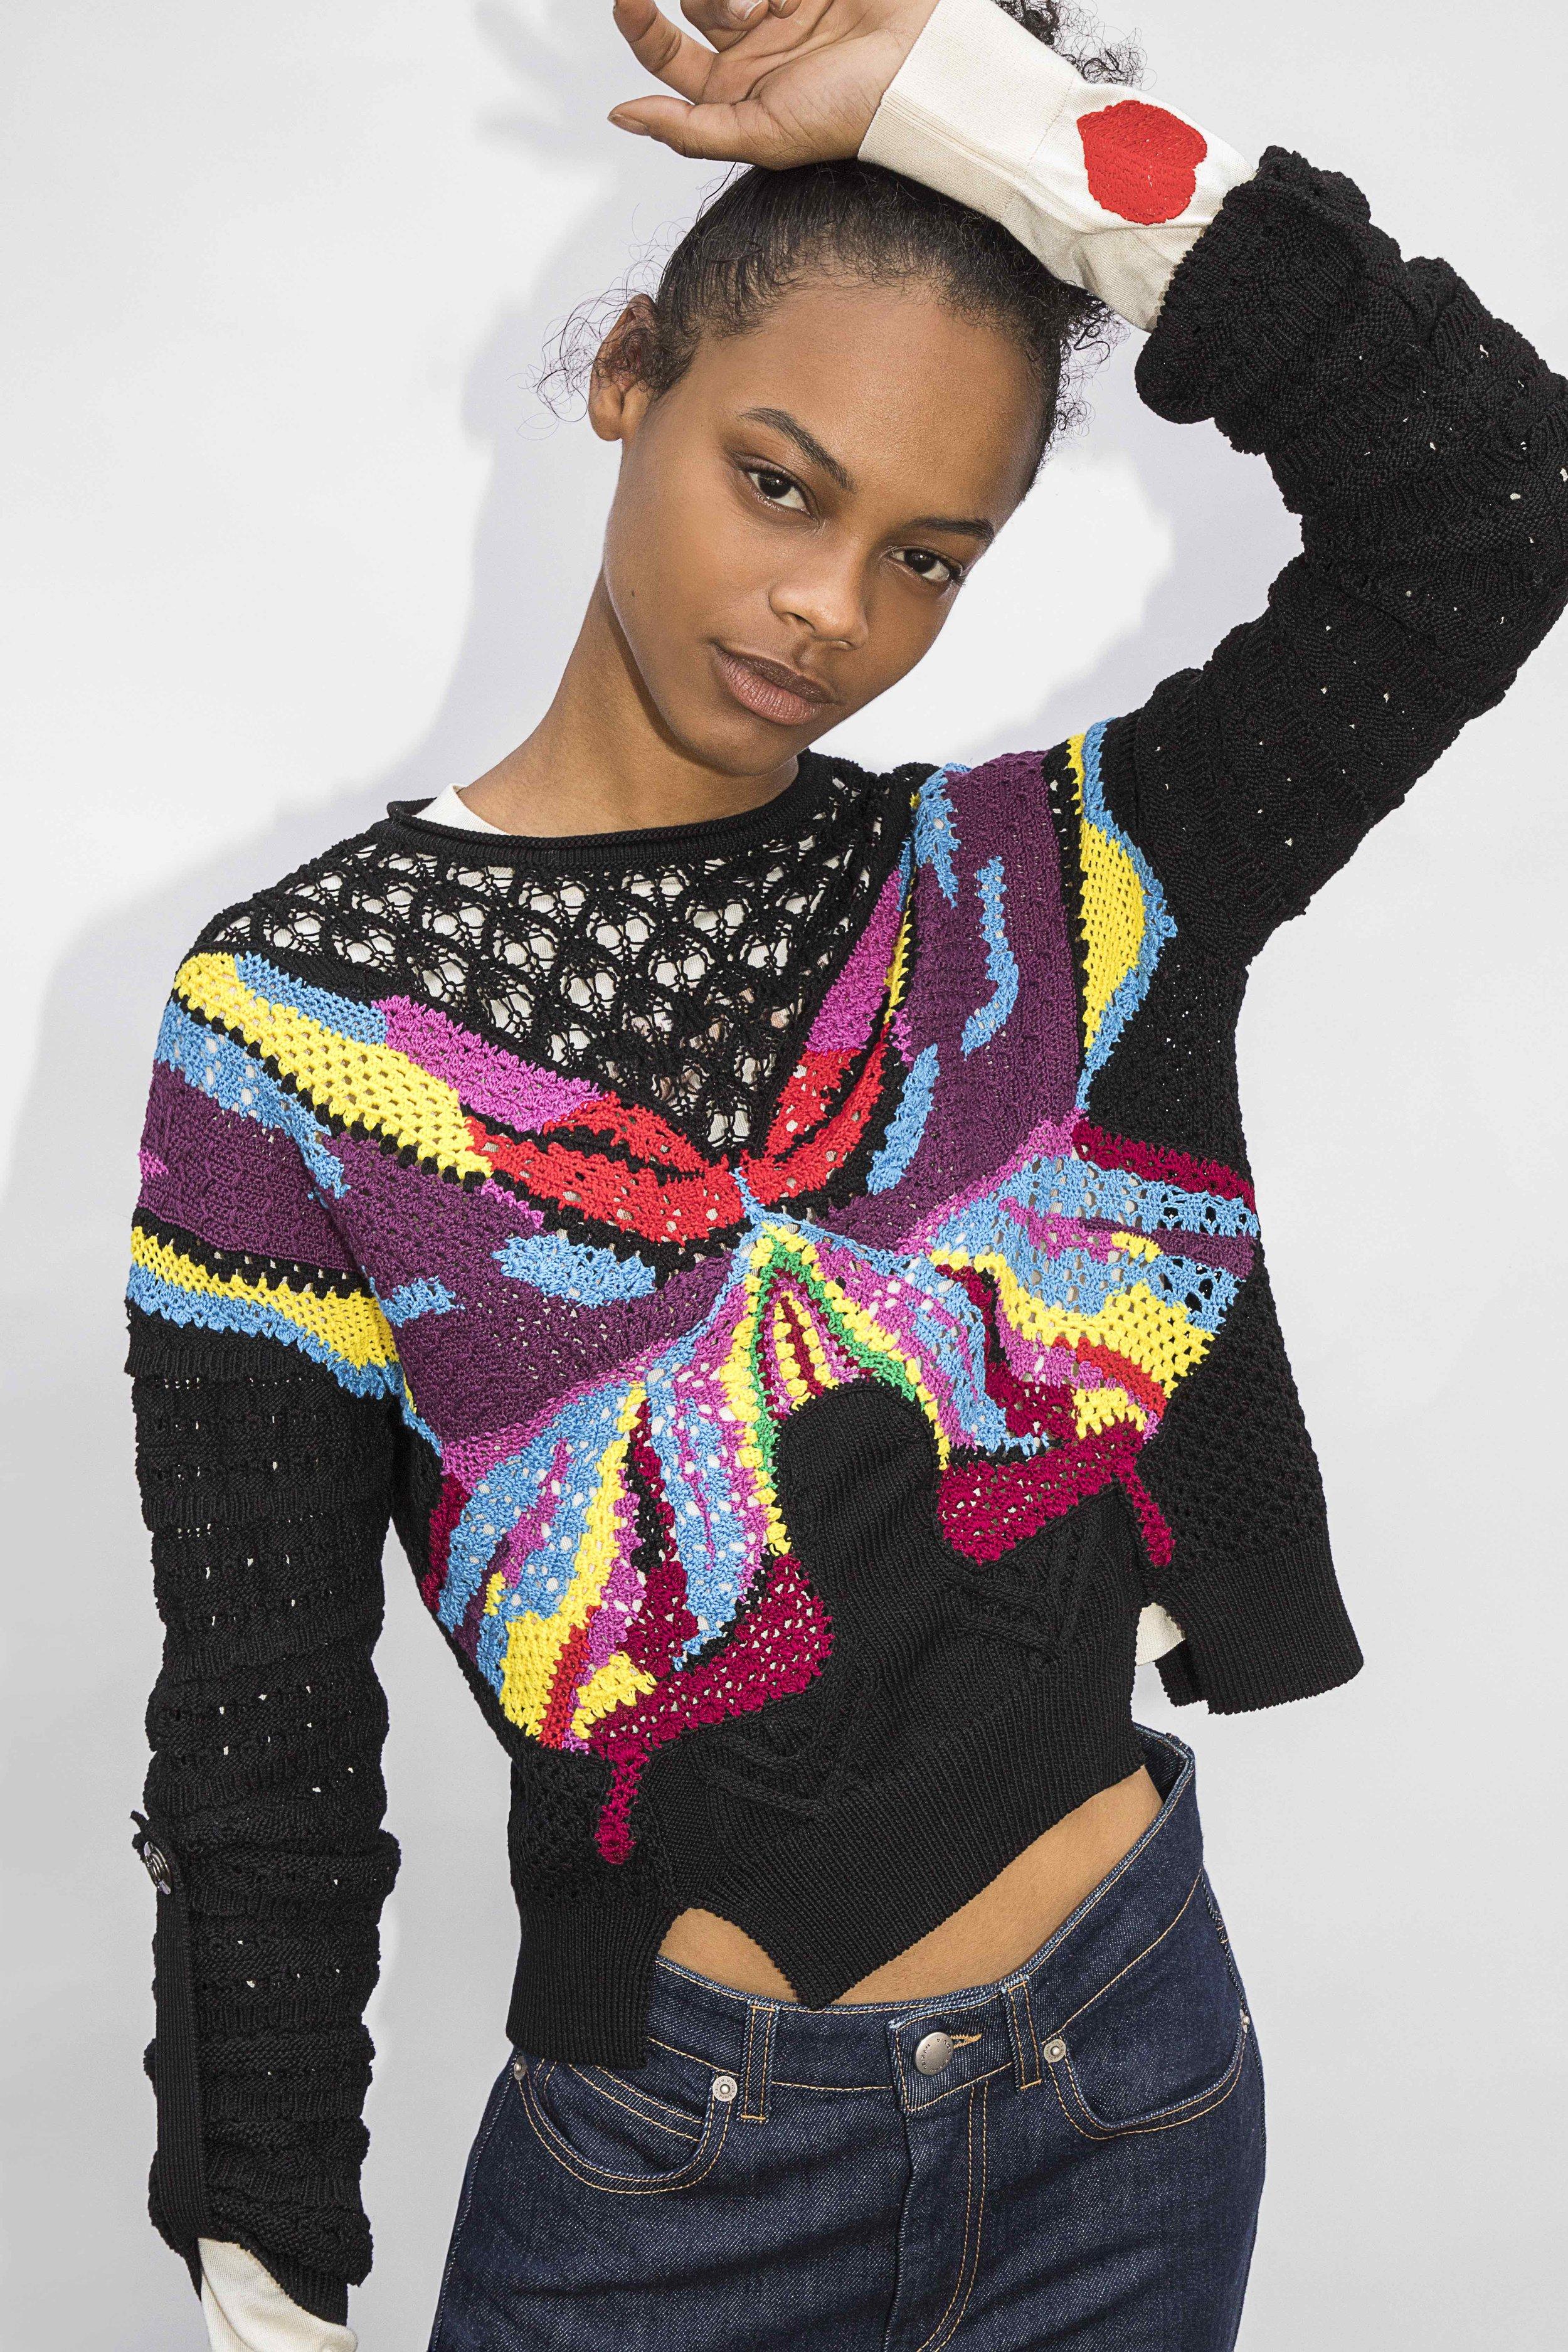 Sophia Boutella's design for Generous Sweaters/Sonia Rykiel.